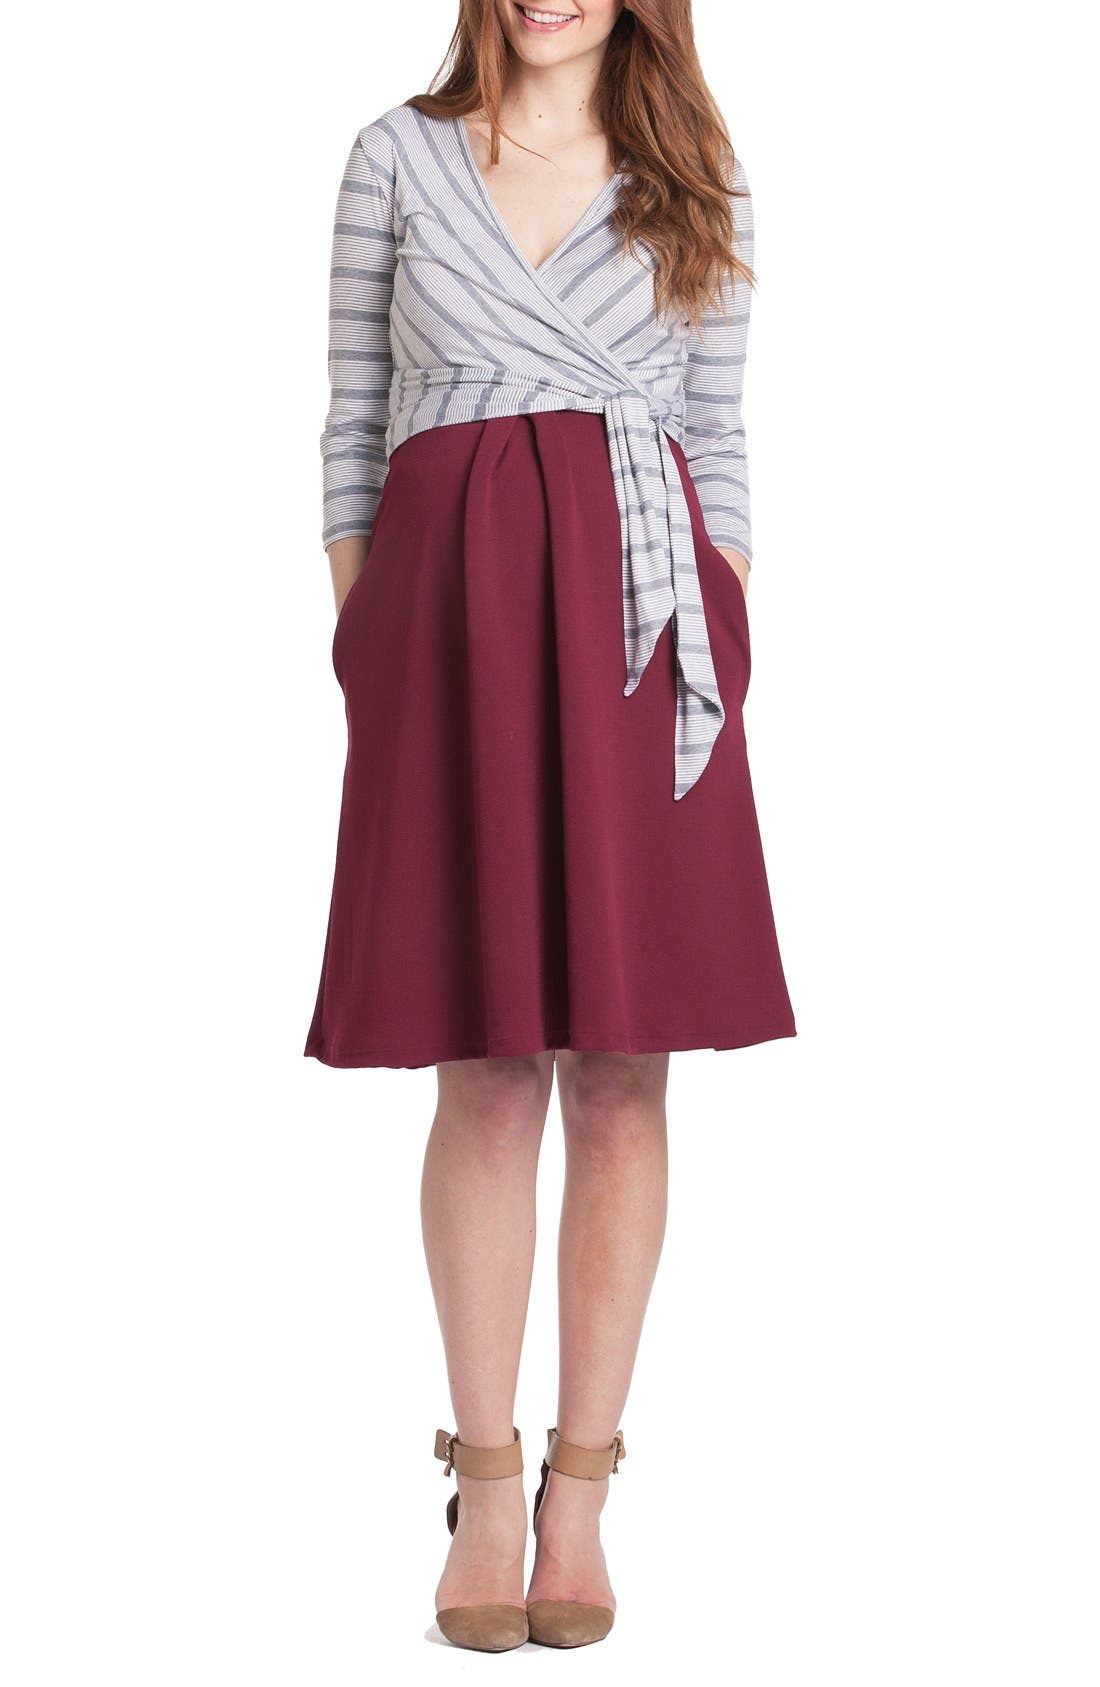 LILAC CLOTHING Abby Maternity/Nursing Dress